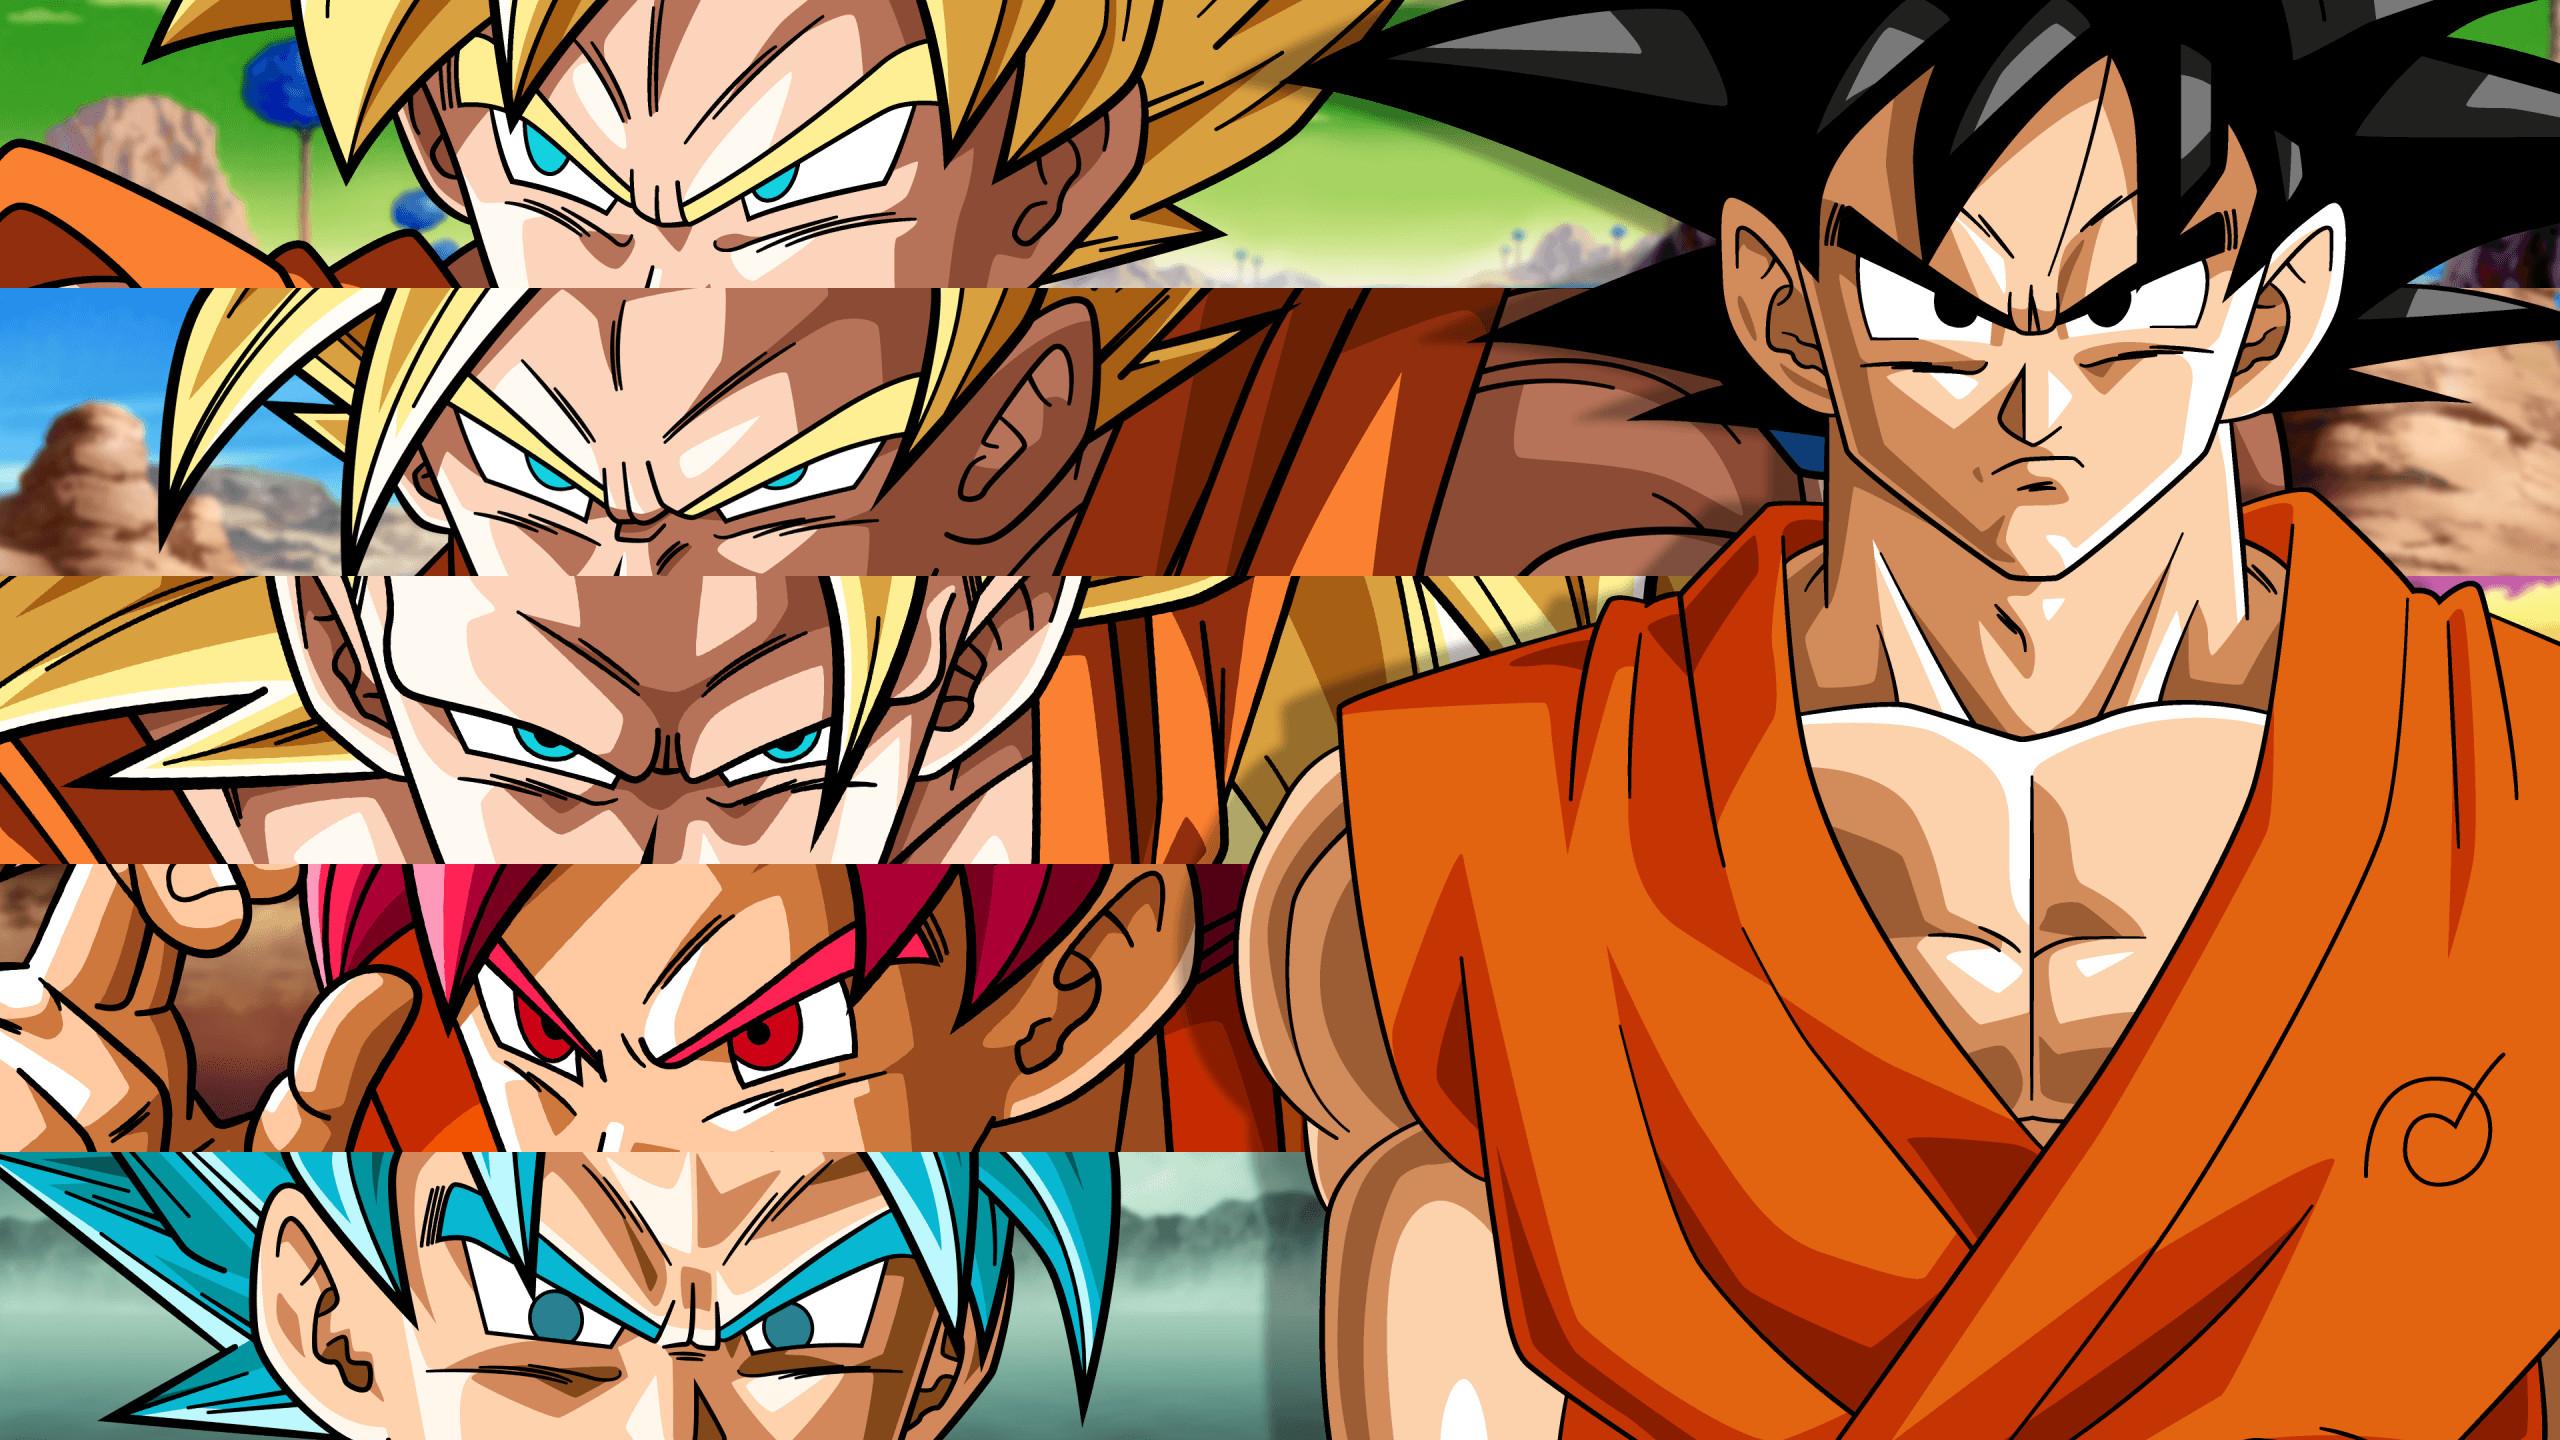 Black Goku Vegeta Dragon Ball Super Wallpaper Hd